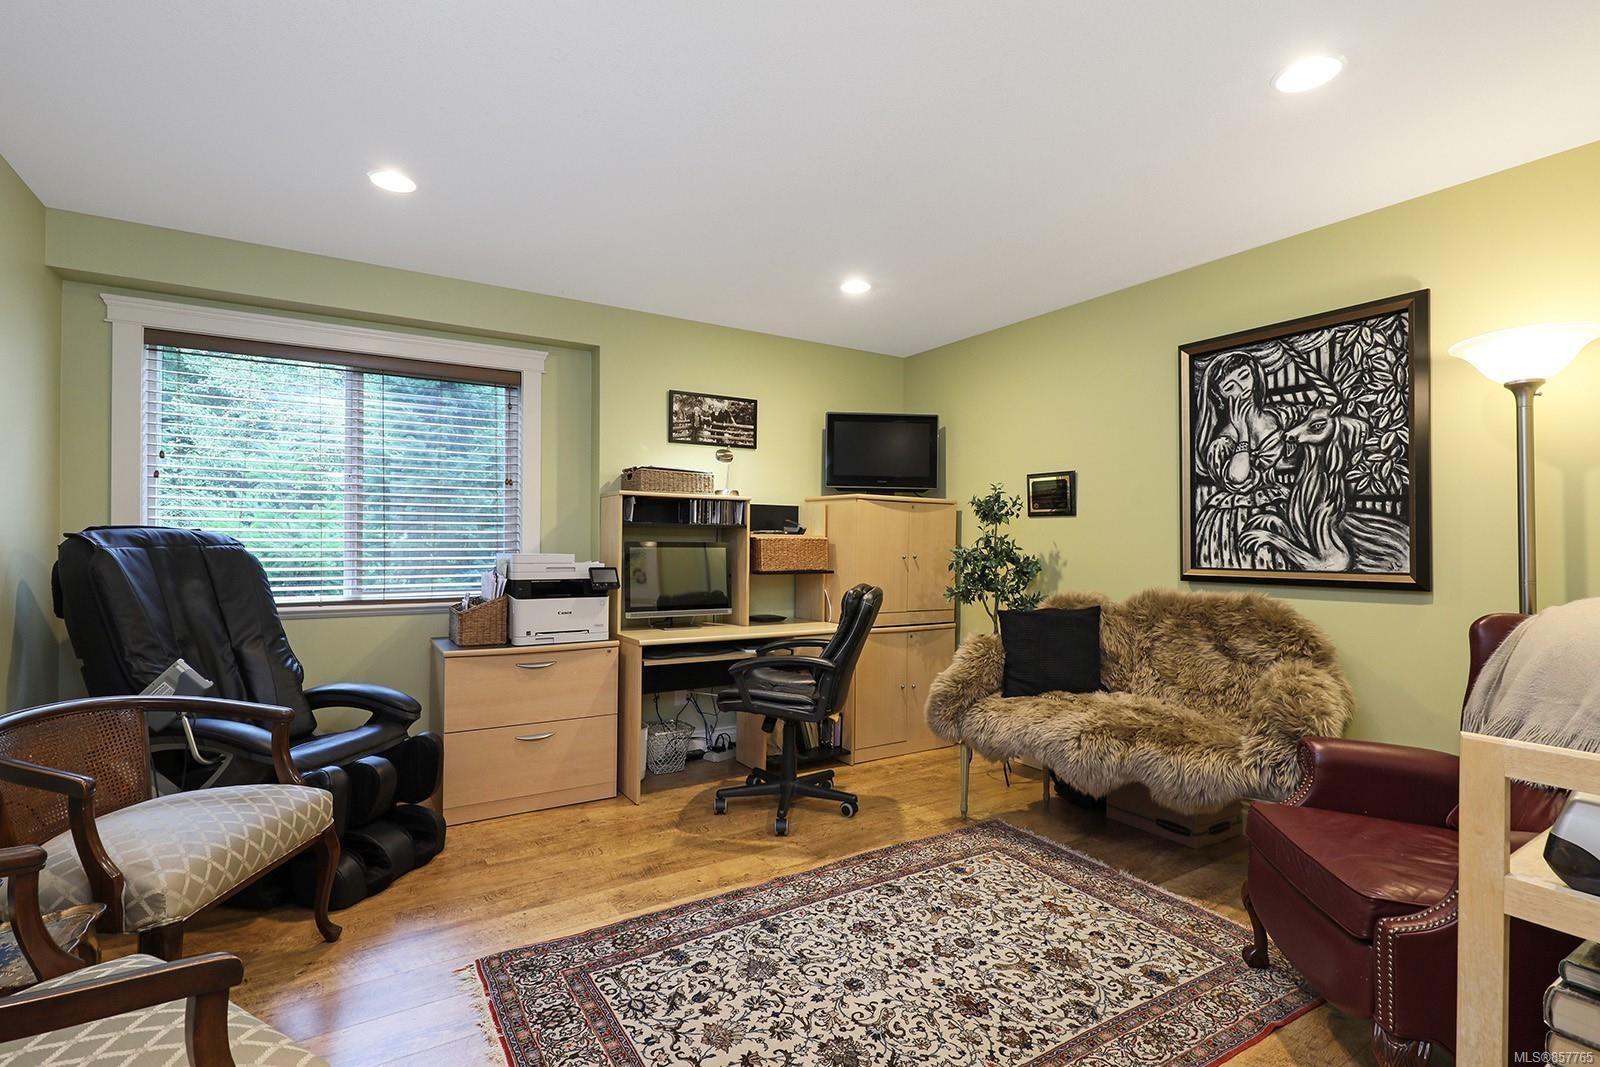 Photo 39: Photos: 1516 Highridge Dr in : CV Comox (Town of) House for sale (Comox Valley)  : MLS®# 857765